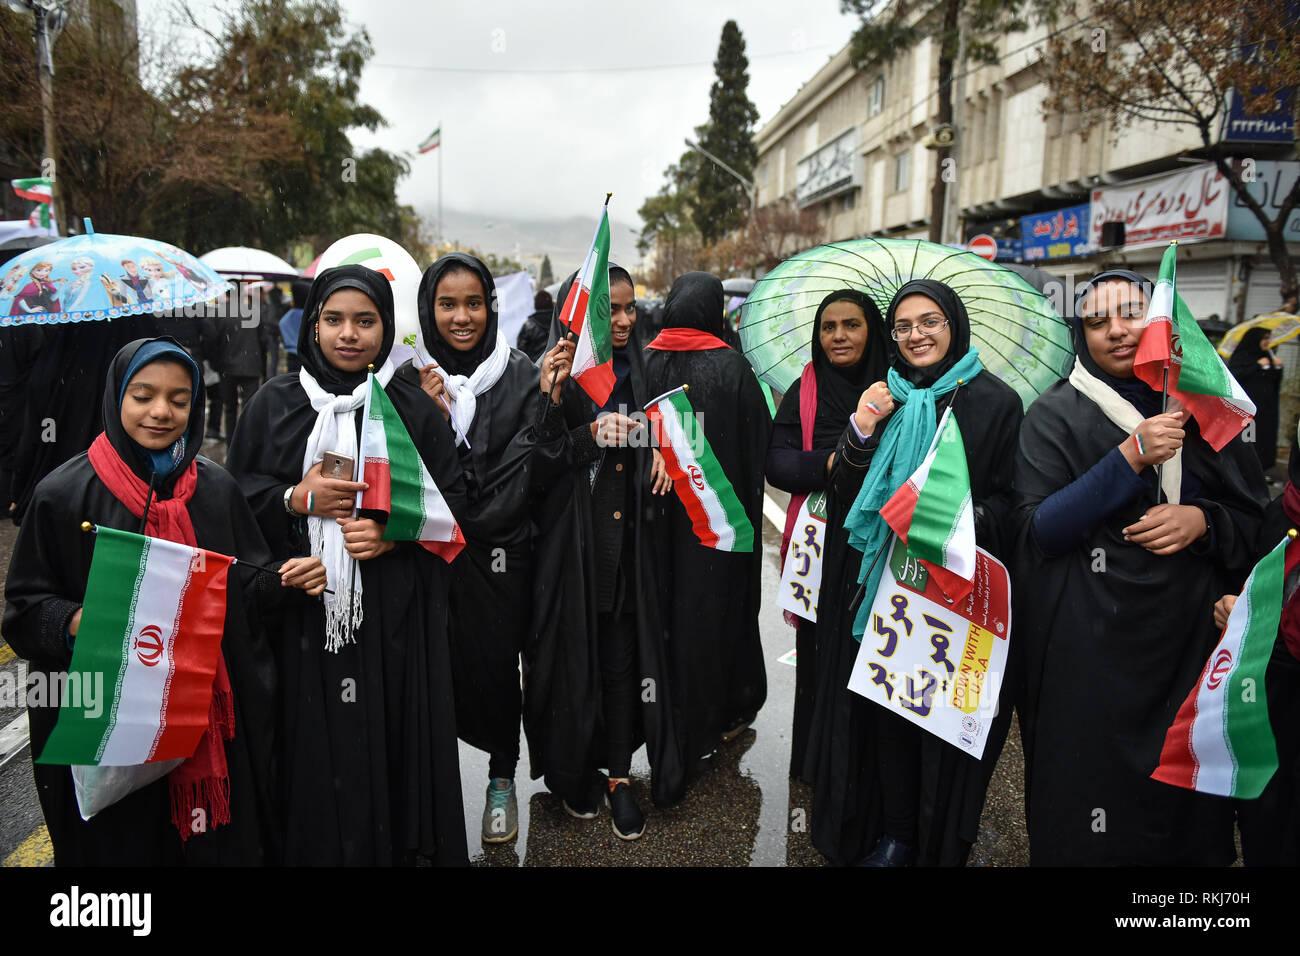 iran dating revolution